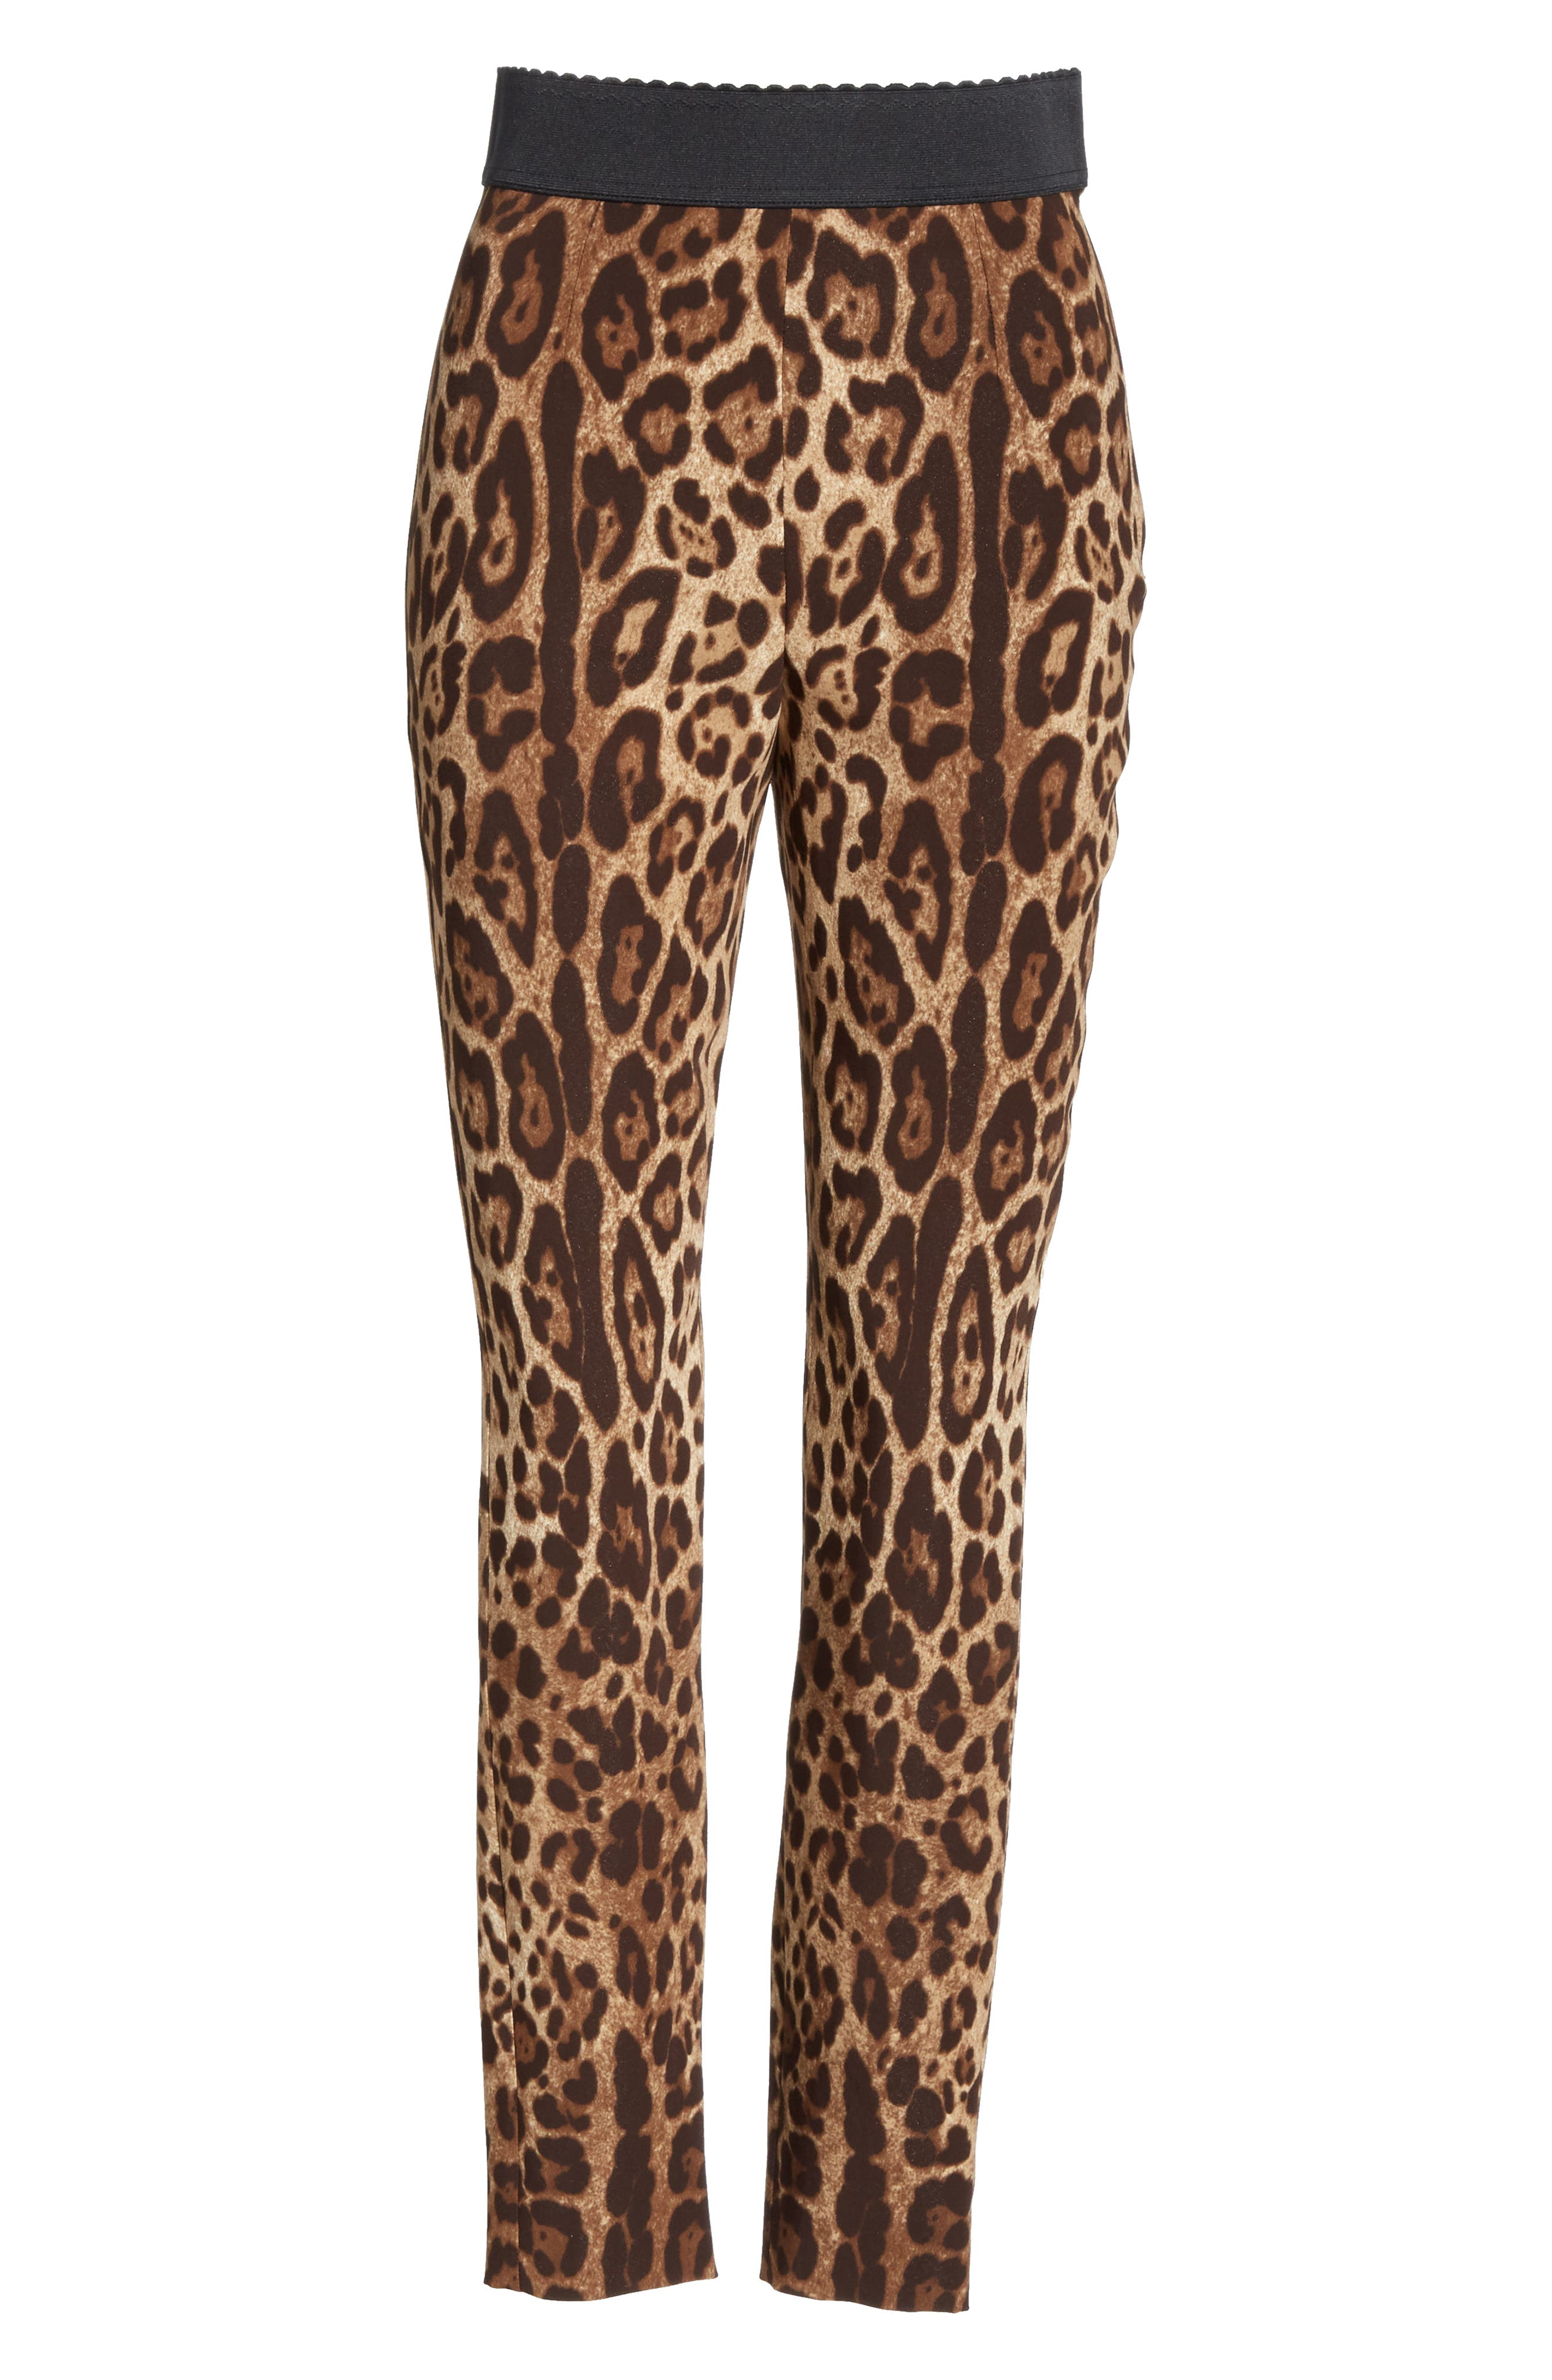 DOLCE&GABBANA,                             Leopard Print Cady Leggings,                             Alternate thumbnail 6, color,                             HY13M LEO